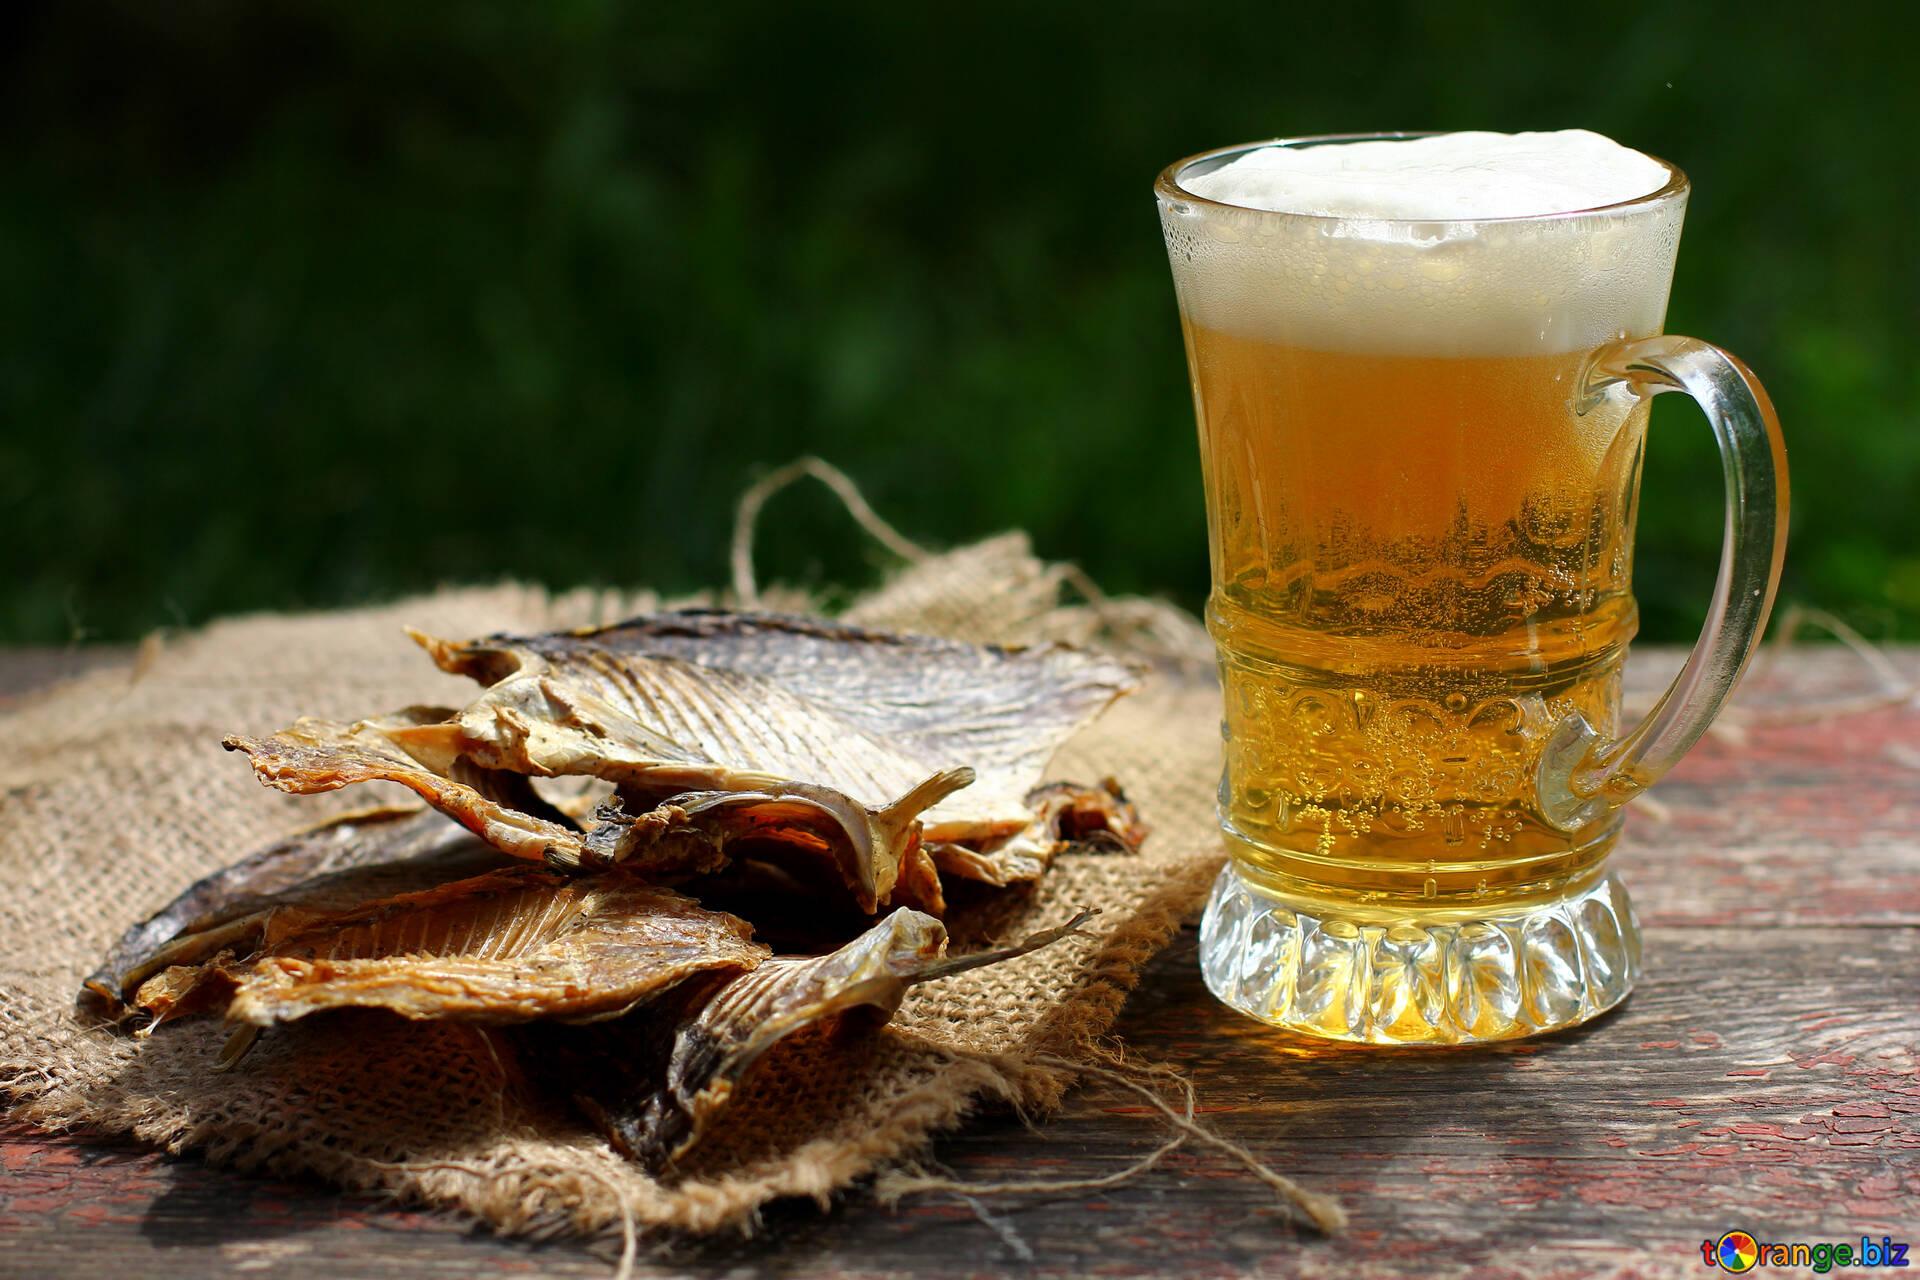 fish dried beer 34485 - Сколько там до той пятницы-то?!